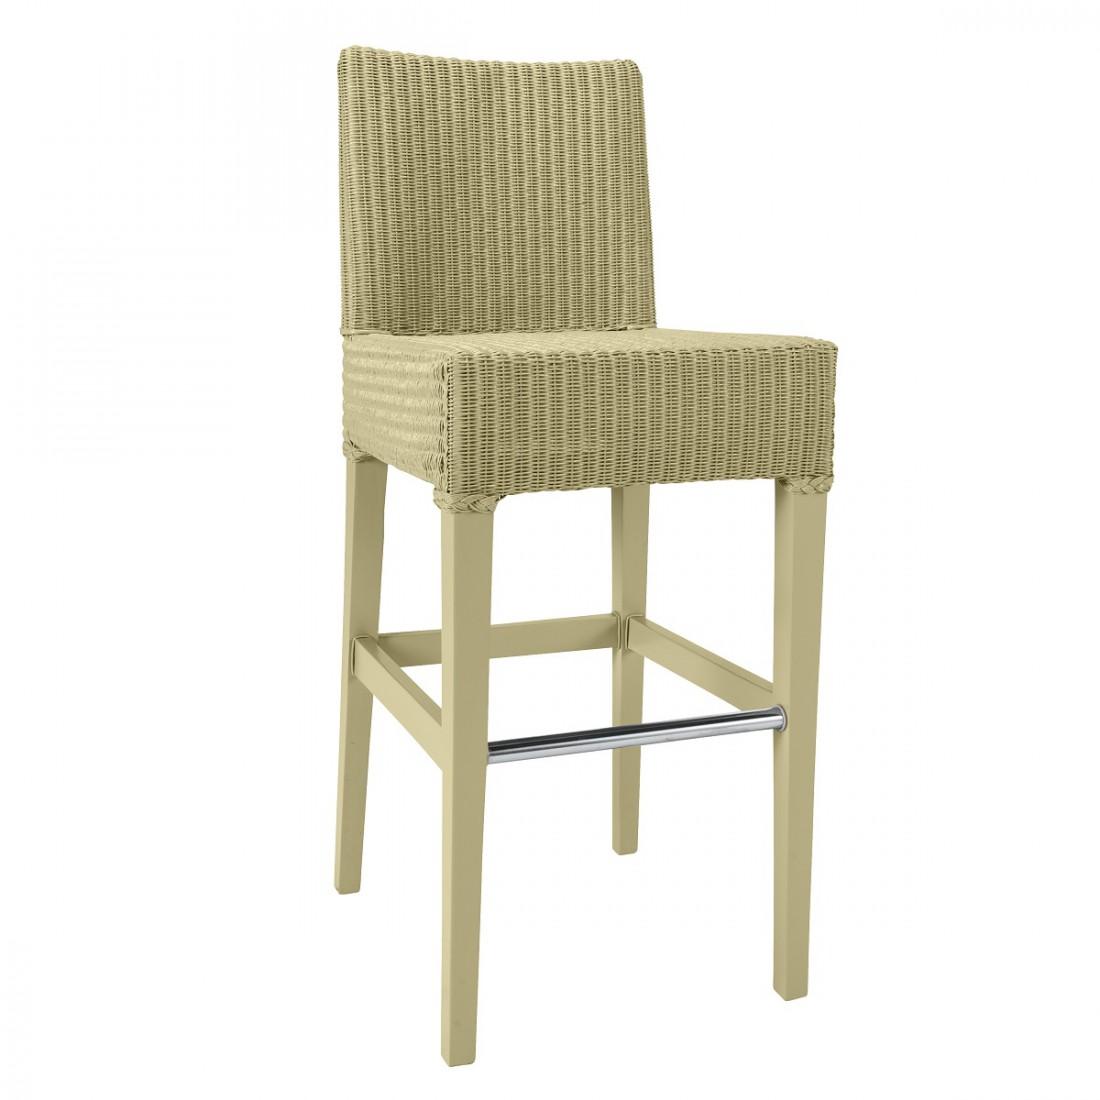 tabouret de bar lloyd loom c sar laqu jaune pass. Black Bedroom Furniture Sets. Home Design Ideas